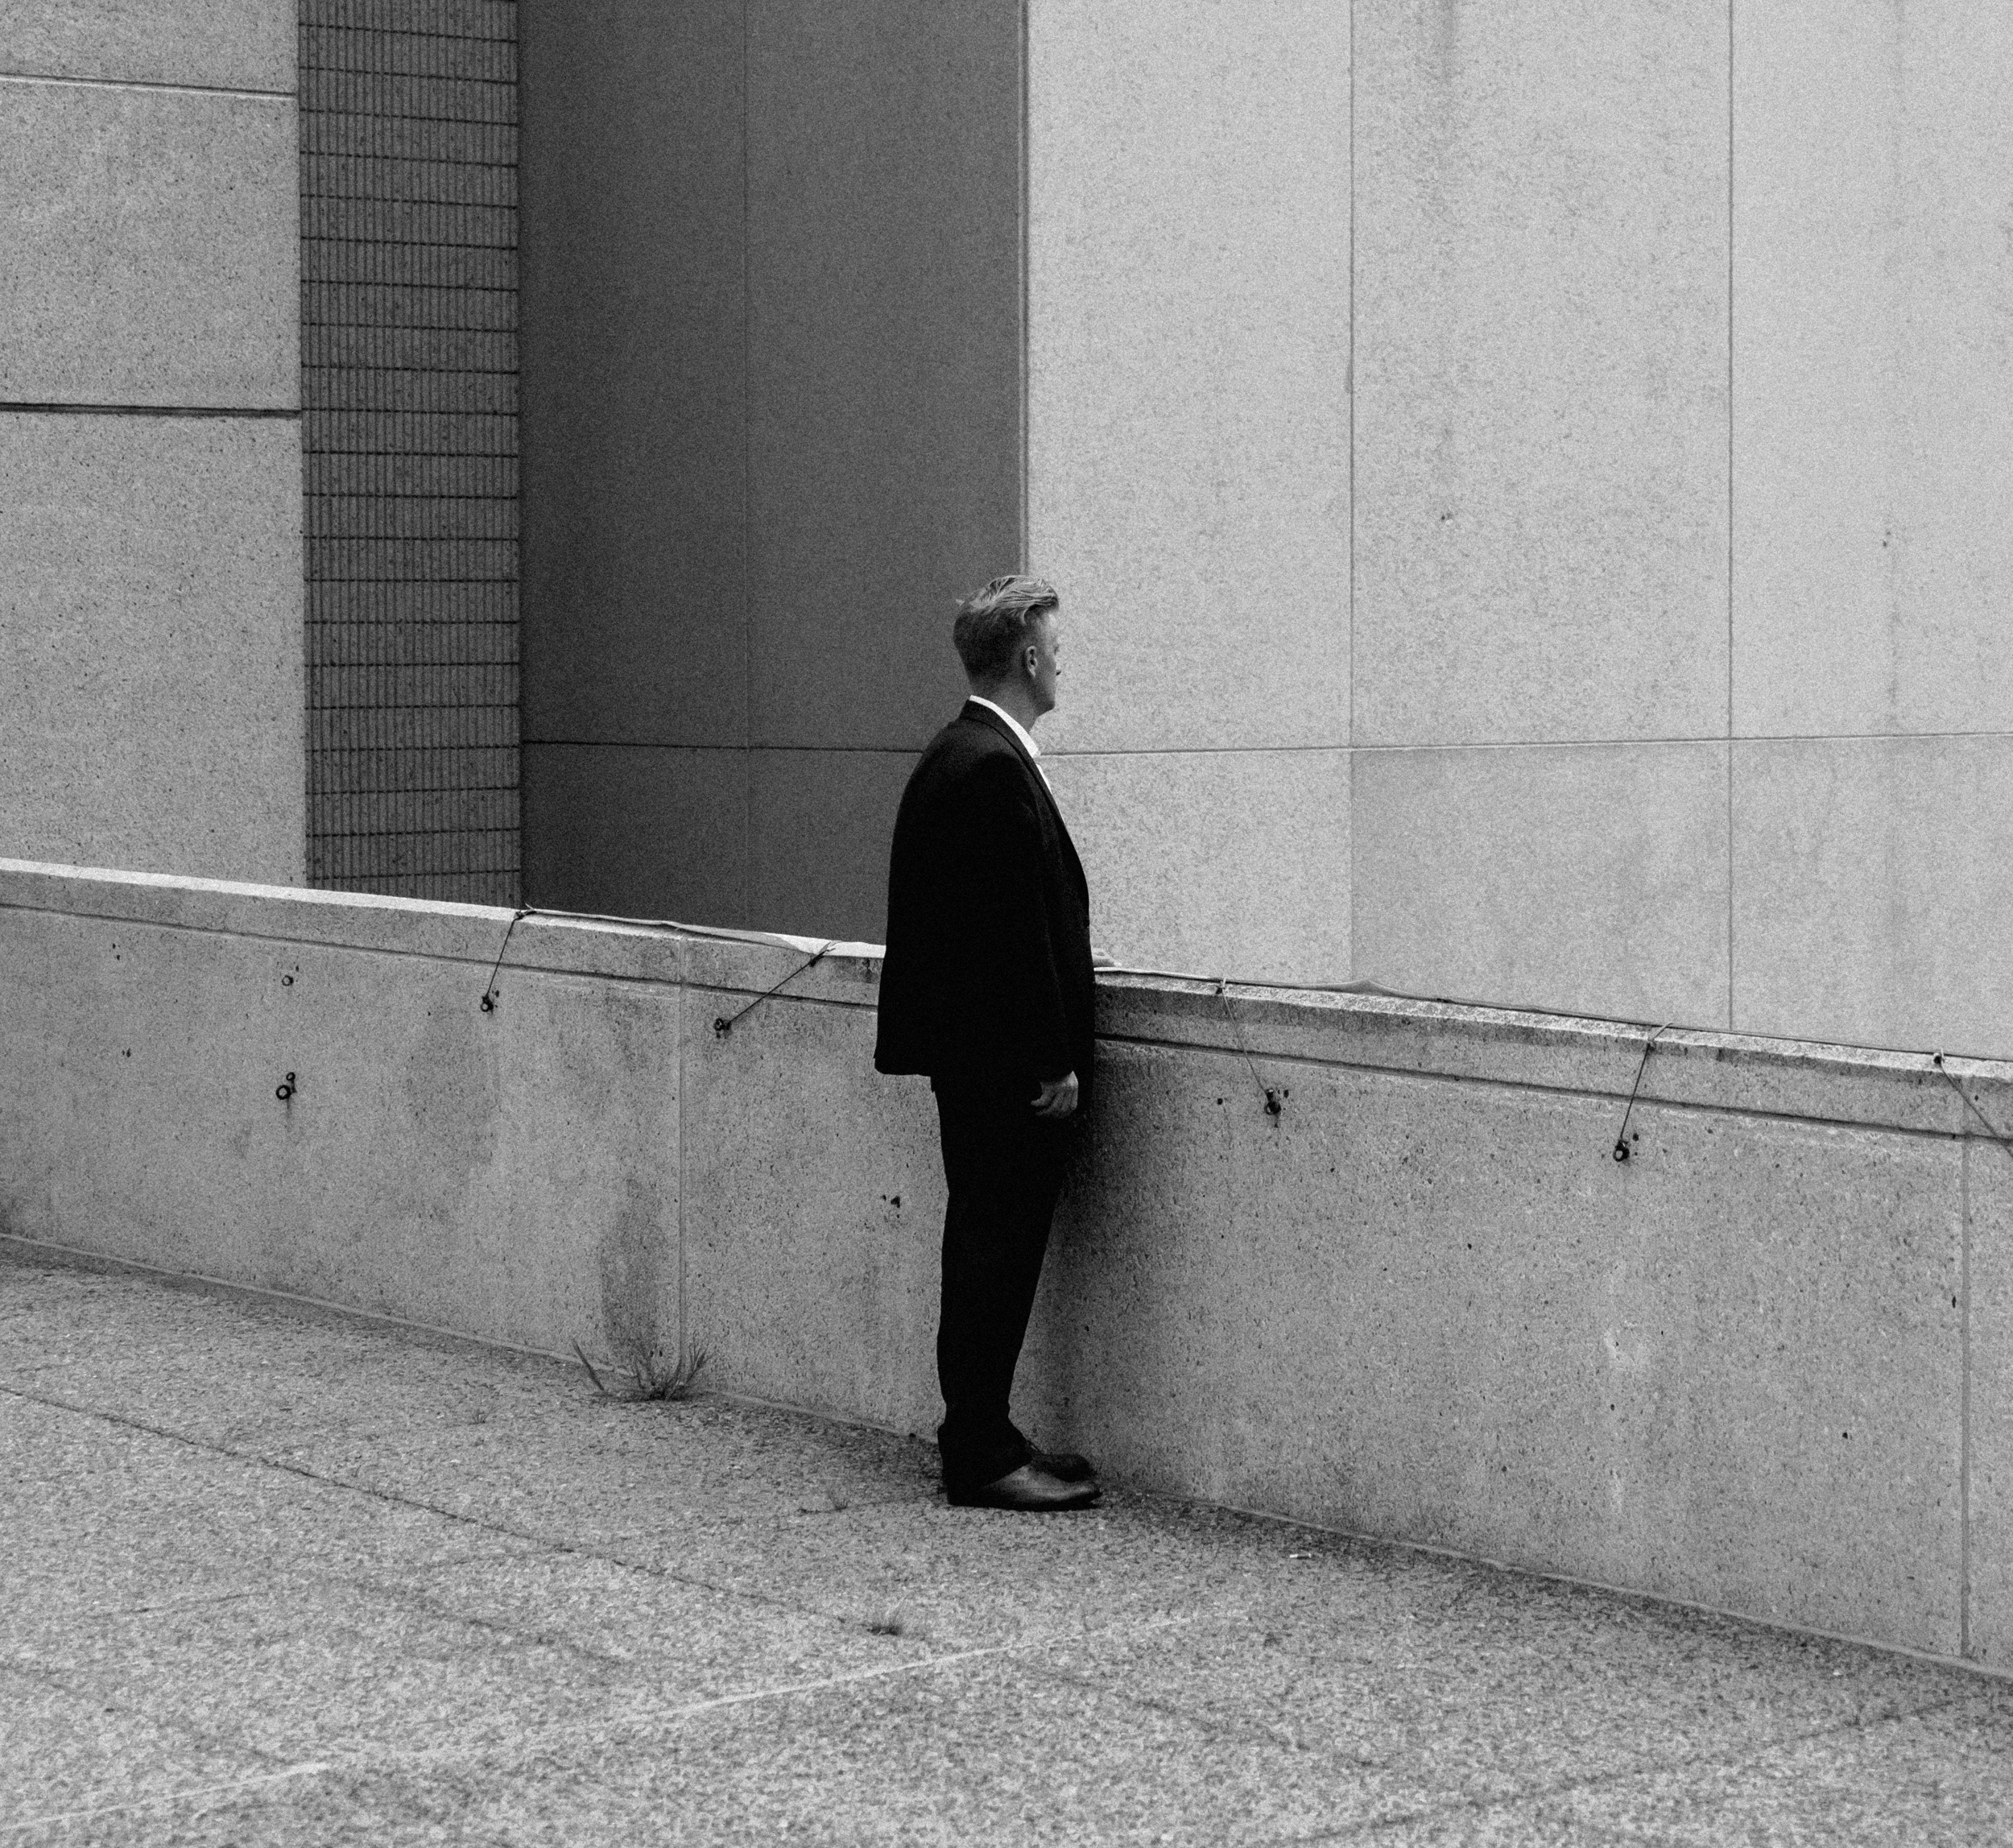 Photo : joshua Ness, Unsplash